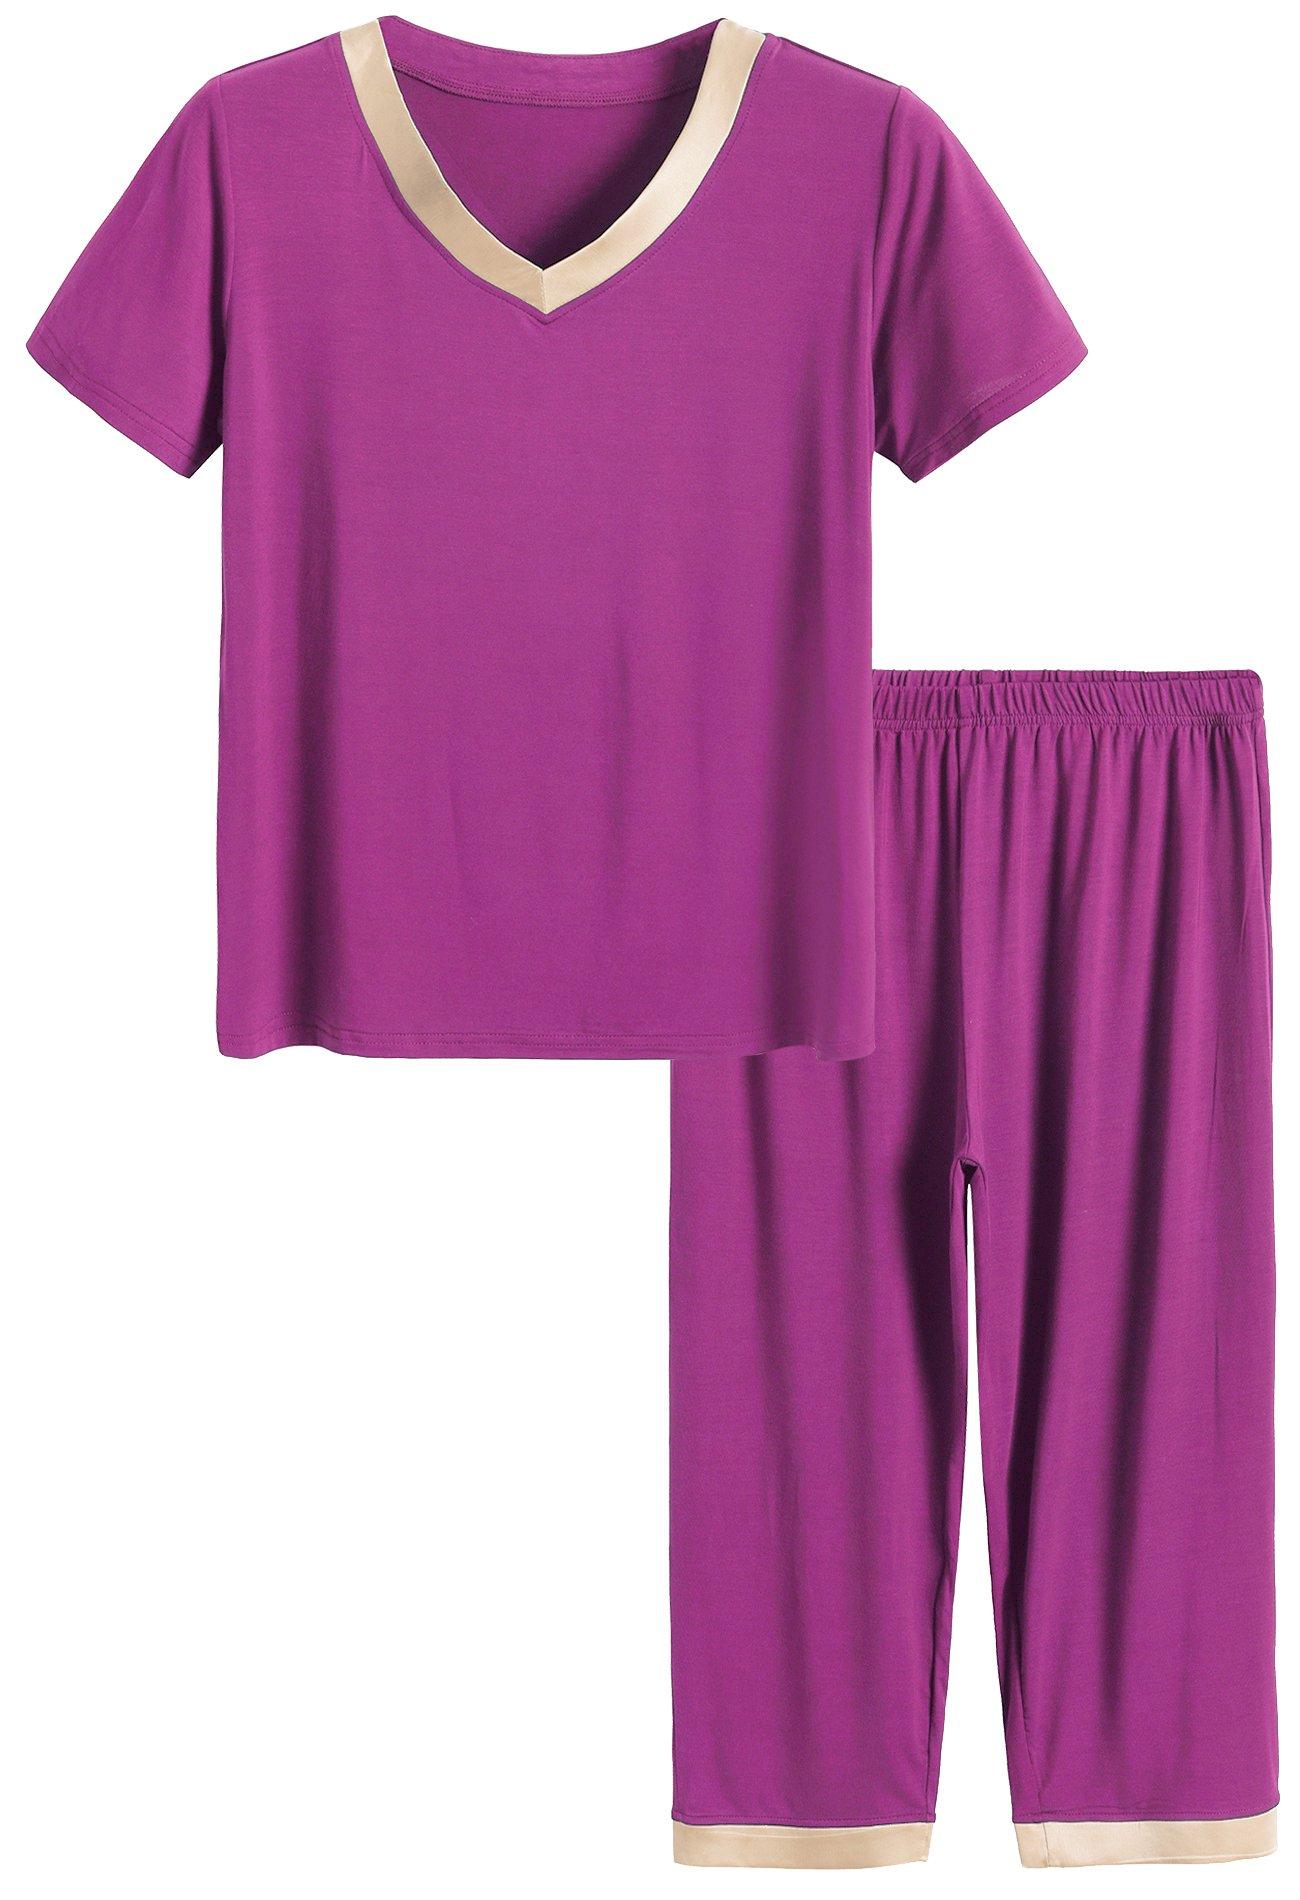 Latuza Women's Sleepwear Tops with Capri Pants Pajama Sets 2X Boysenberry with Khaki Satin